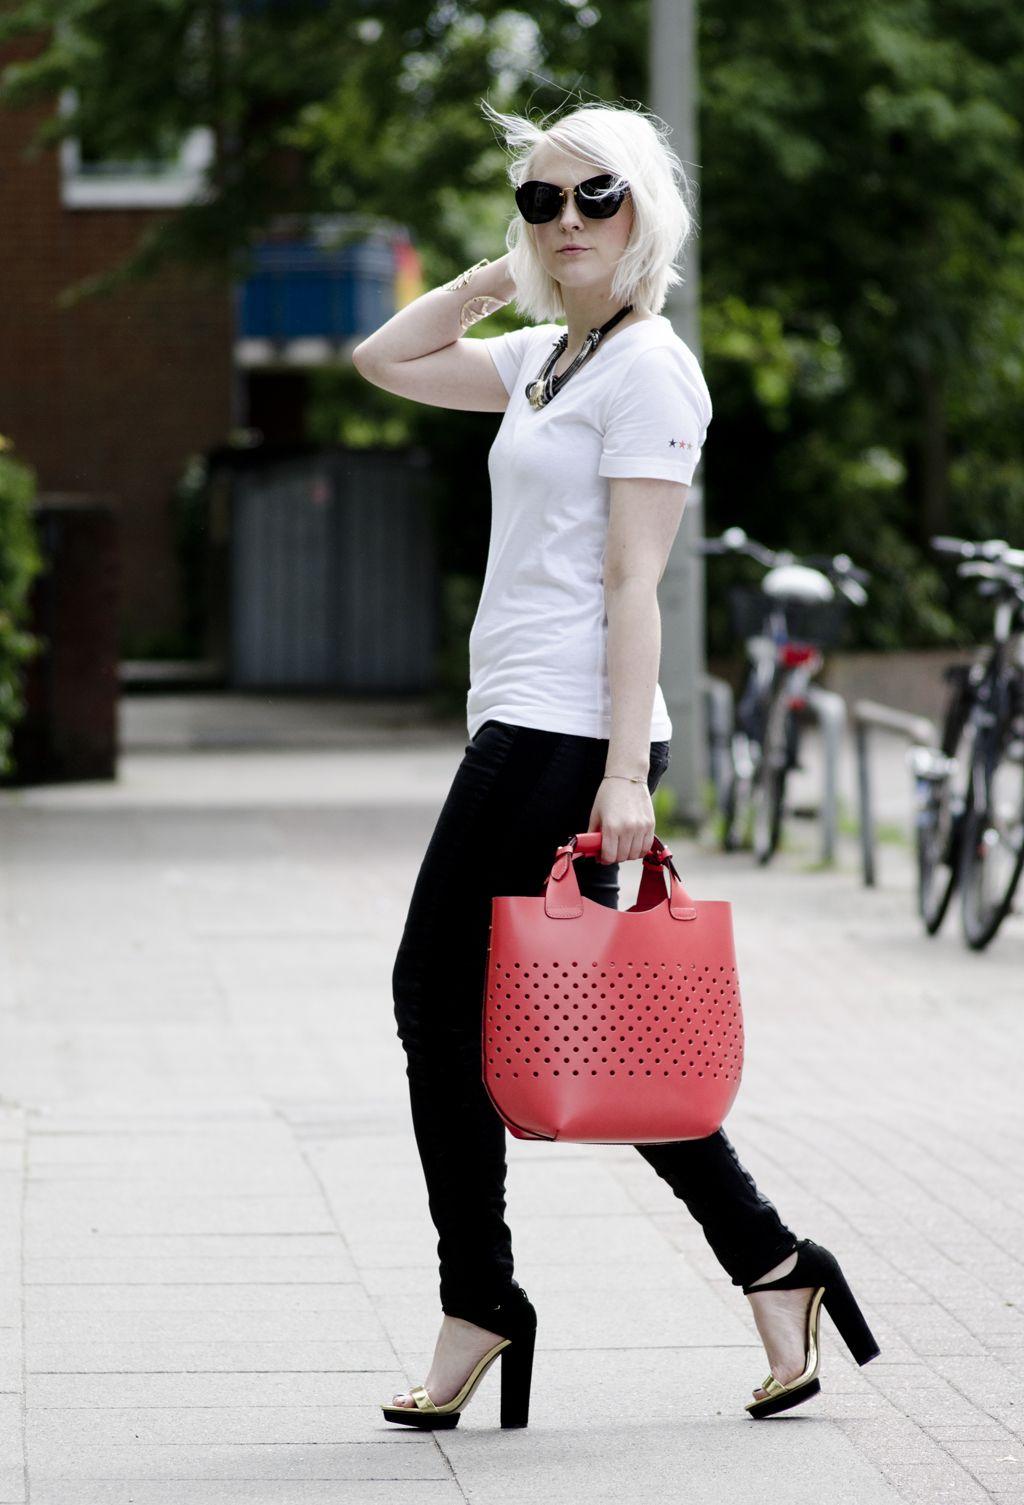 fanfieber anna frost fashionpuppe miu miu sunglasses zara high heels gold black red bag